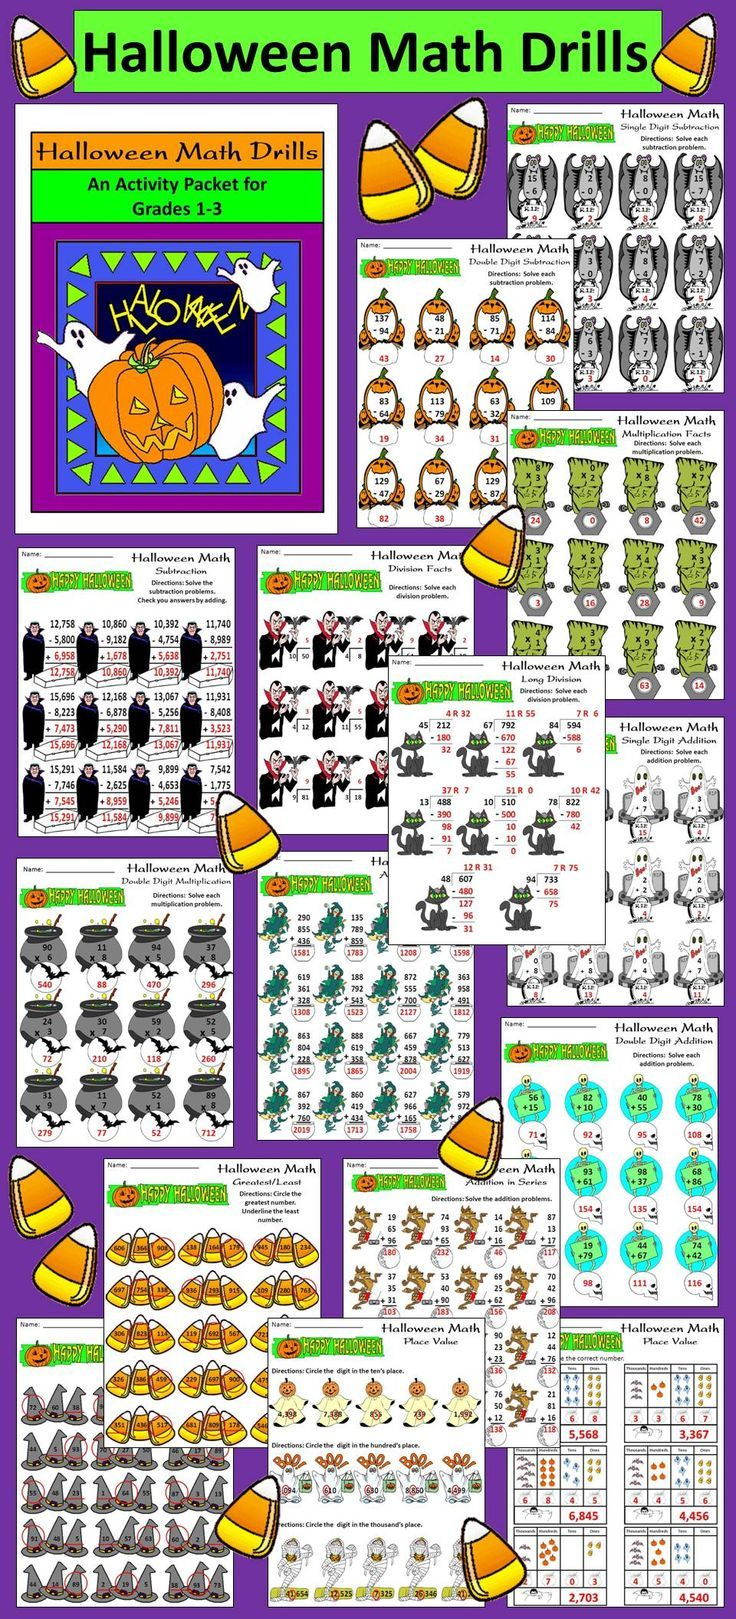 Halloween Math Activities: Halloween Math Drills Activity Packet ...